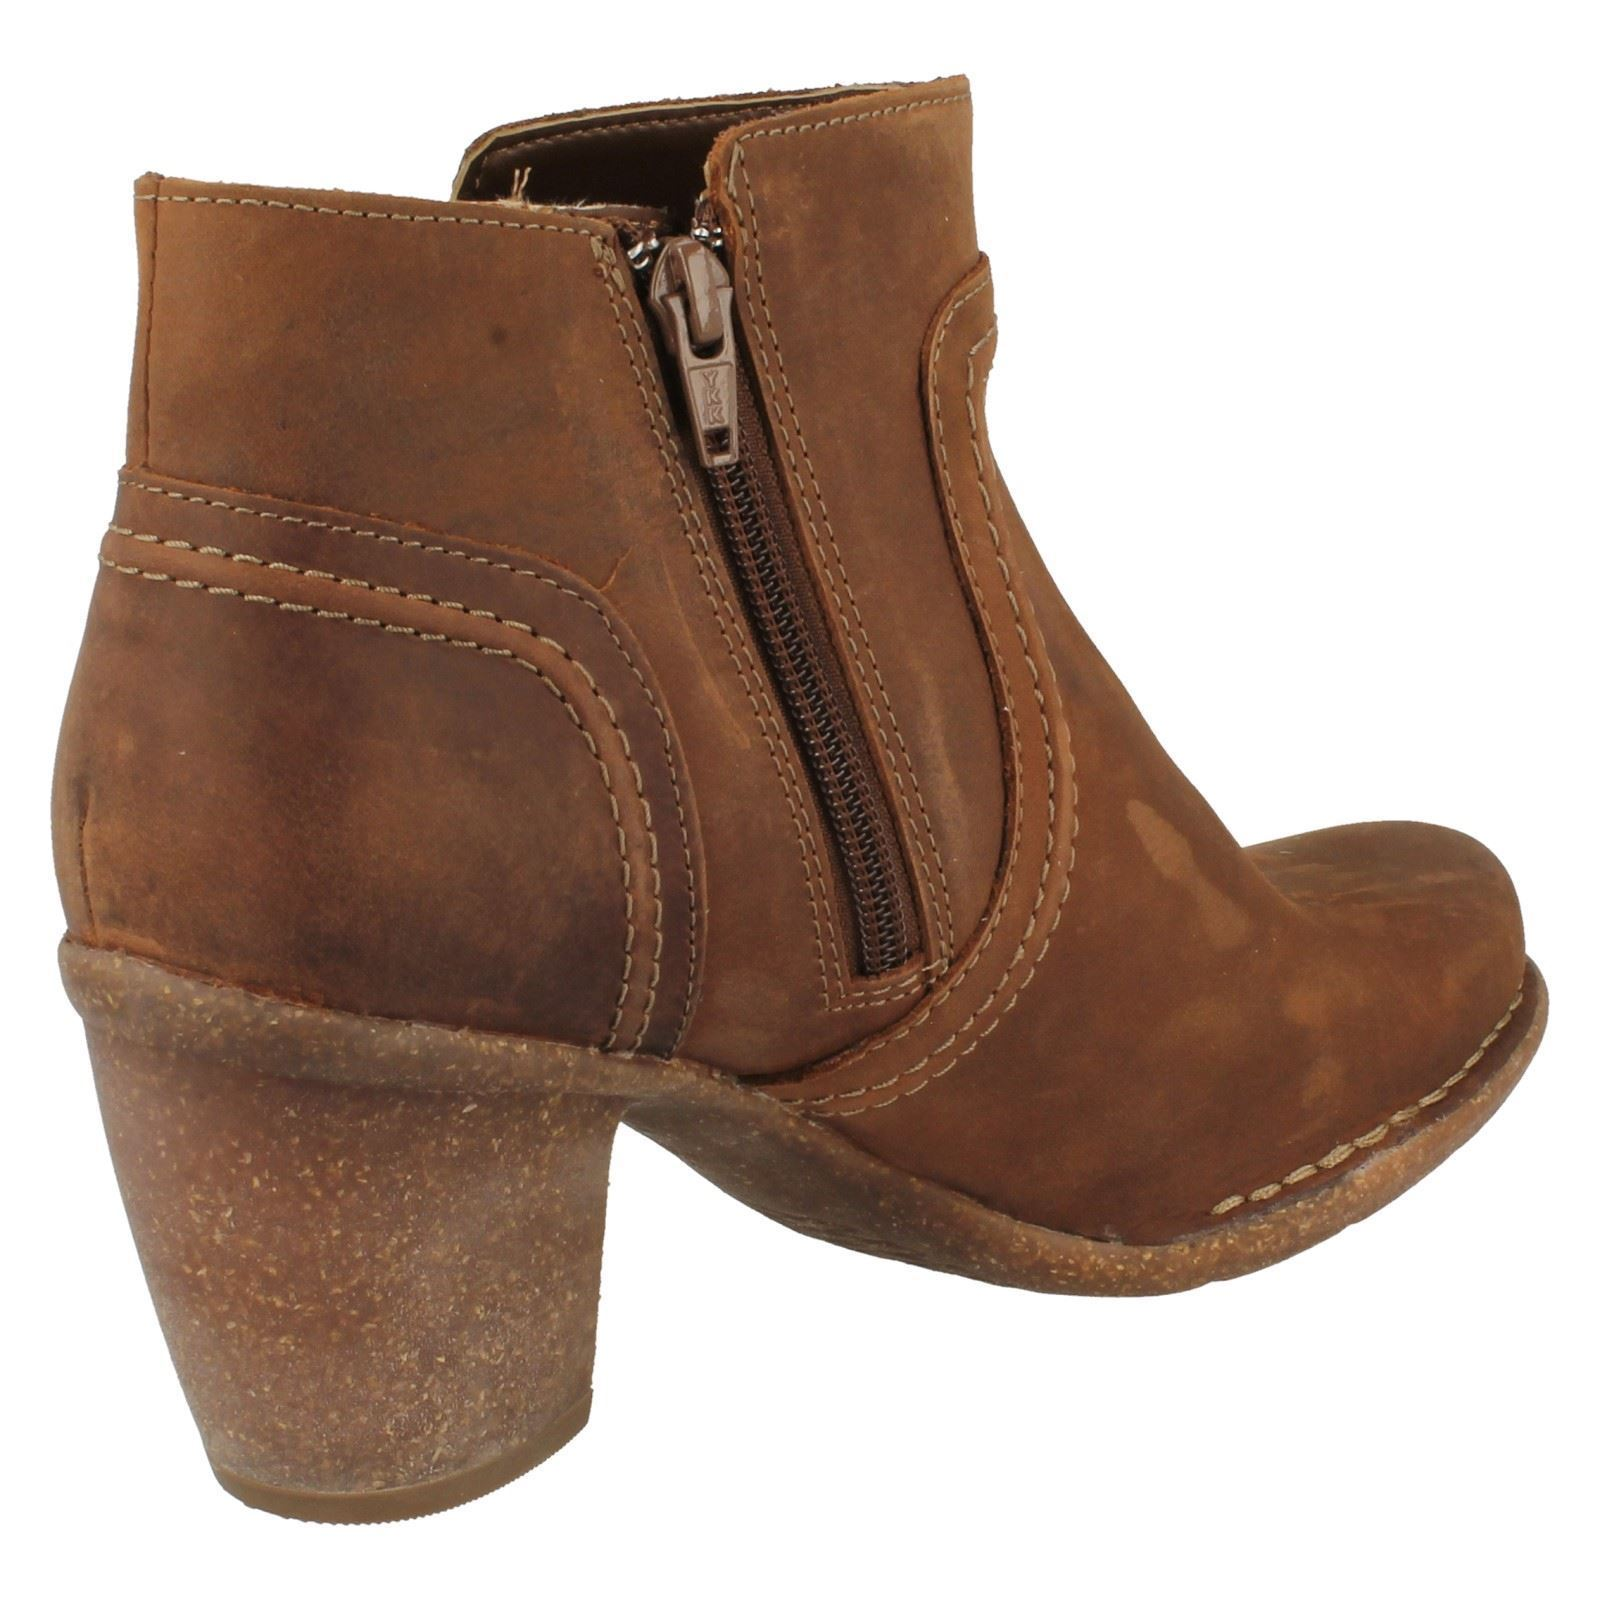 Clarks Ladies Chunky Ankle Ankle Chunky Boots Carleta Paris 4100de